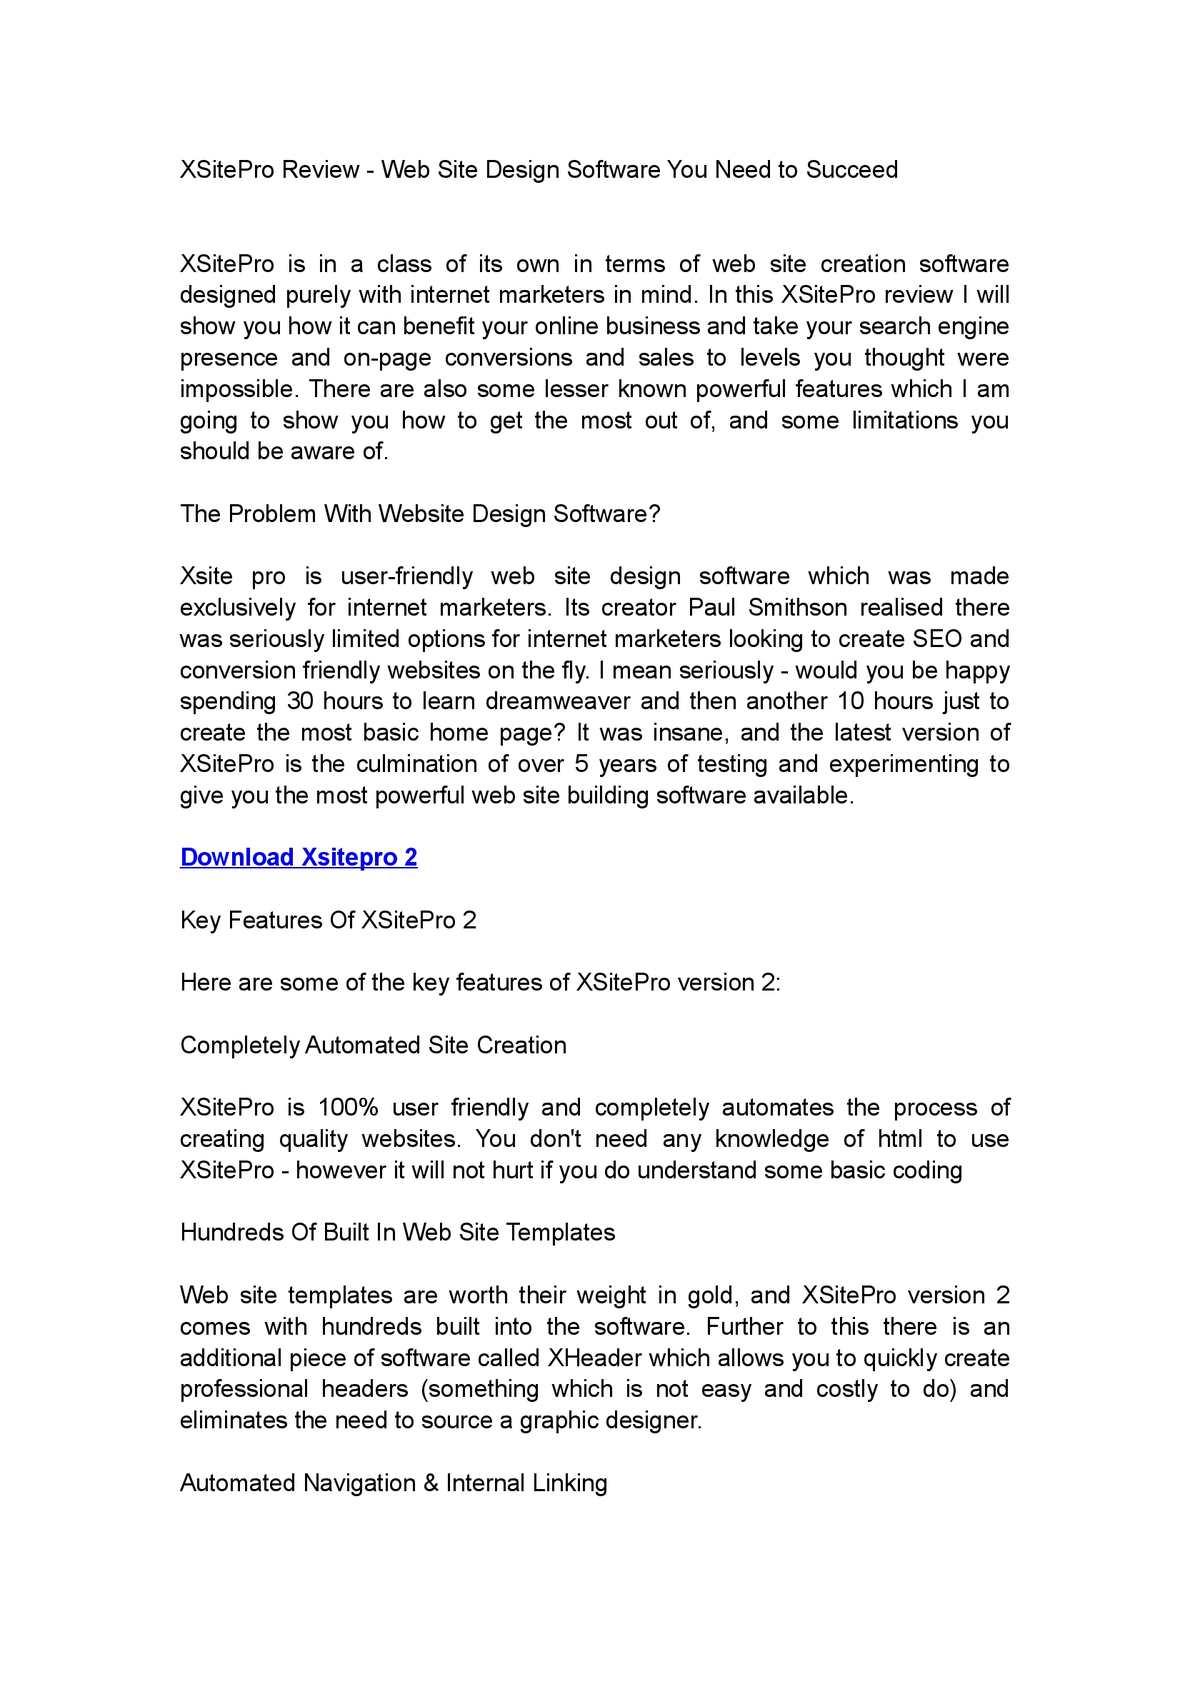 Calaméo xsitepro review best web site design software.